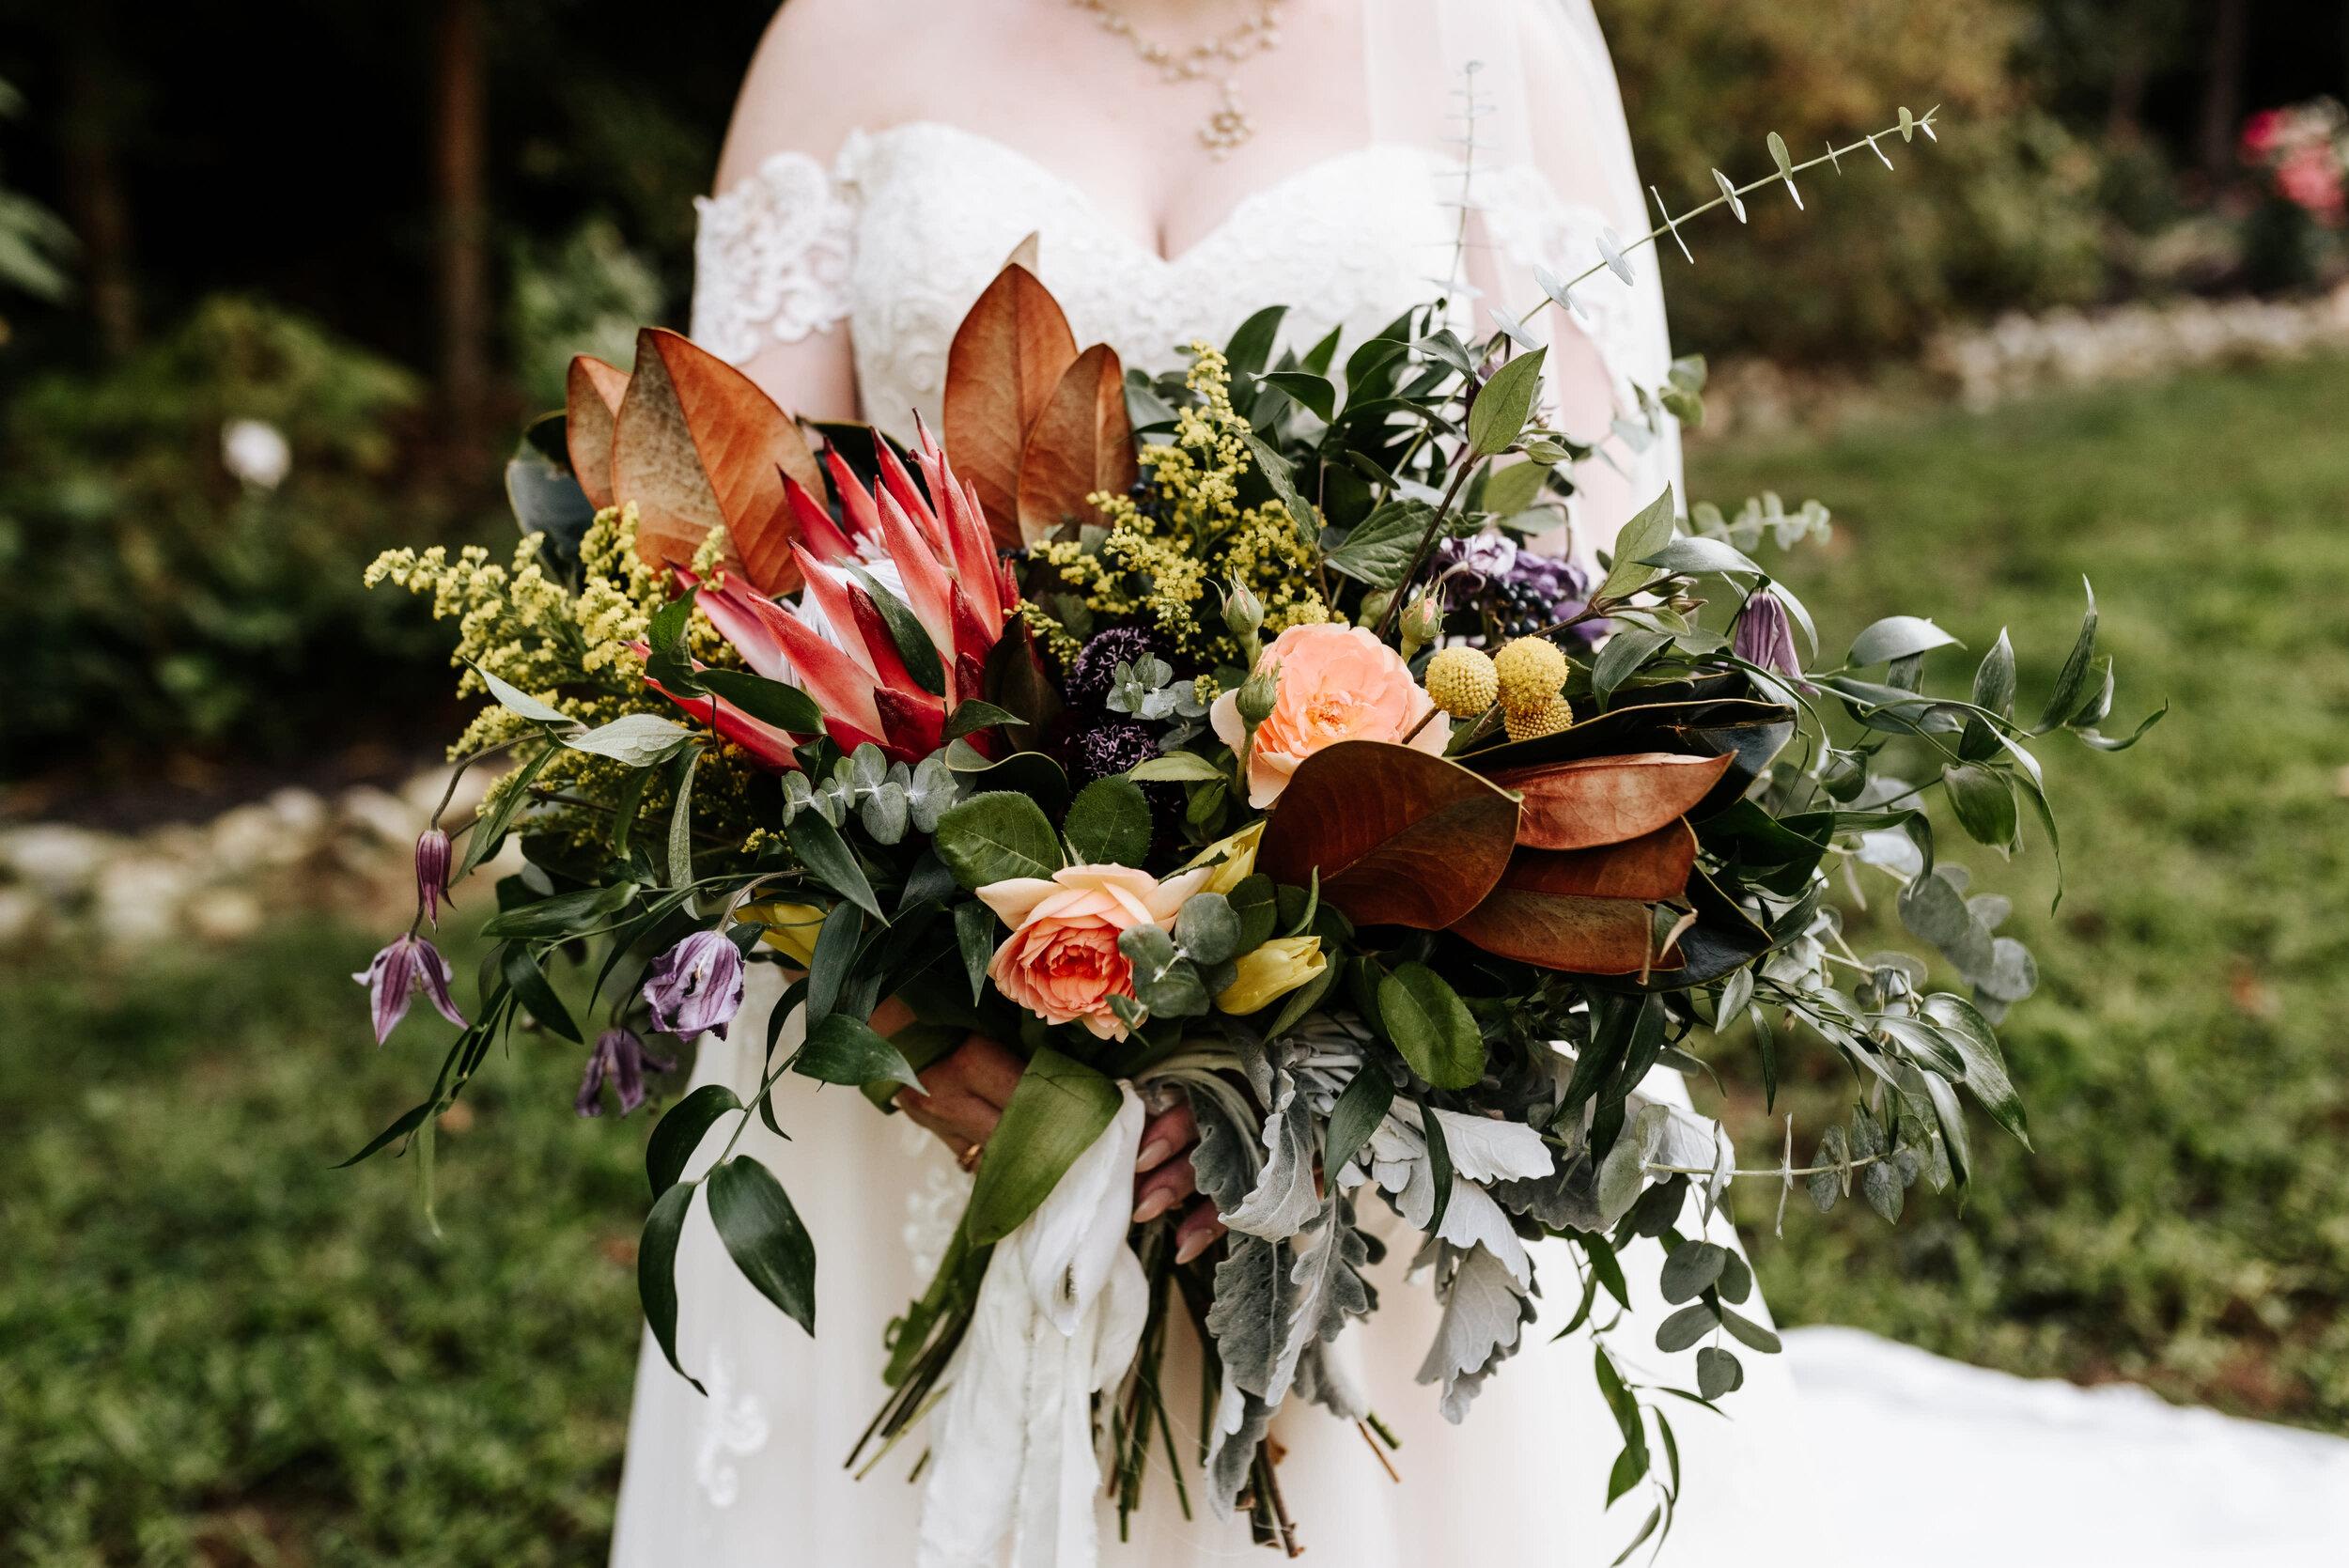 Rachel_David_Wedding_Richmond_Virginia_Photography_by_V_49.jpg